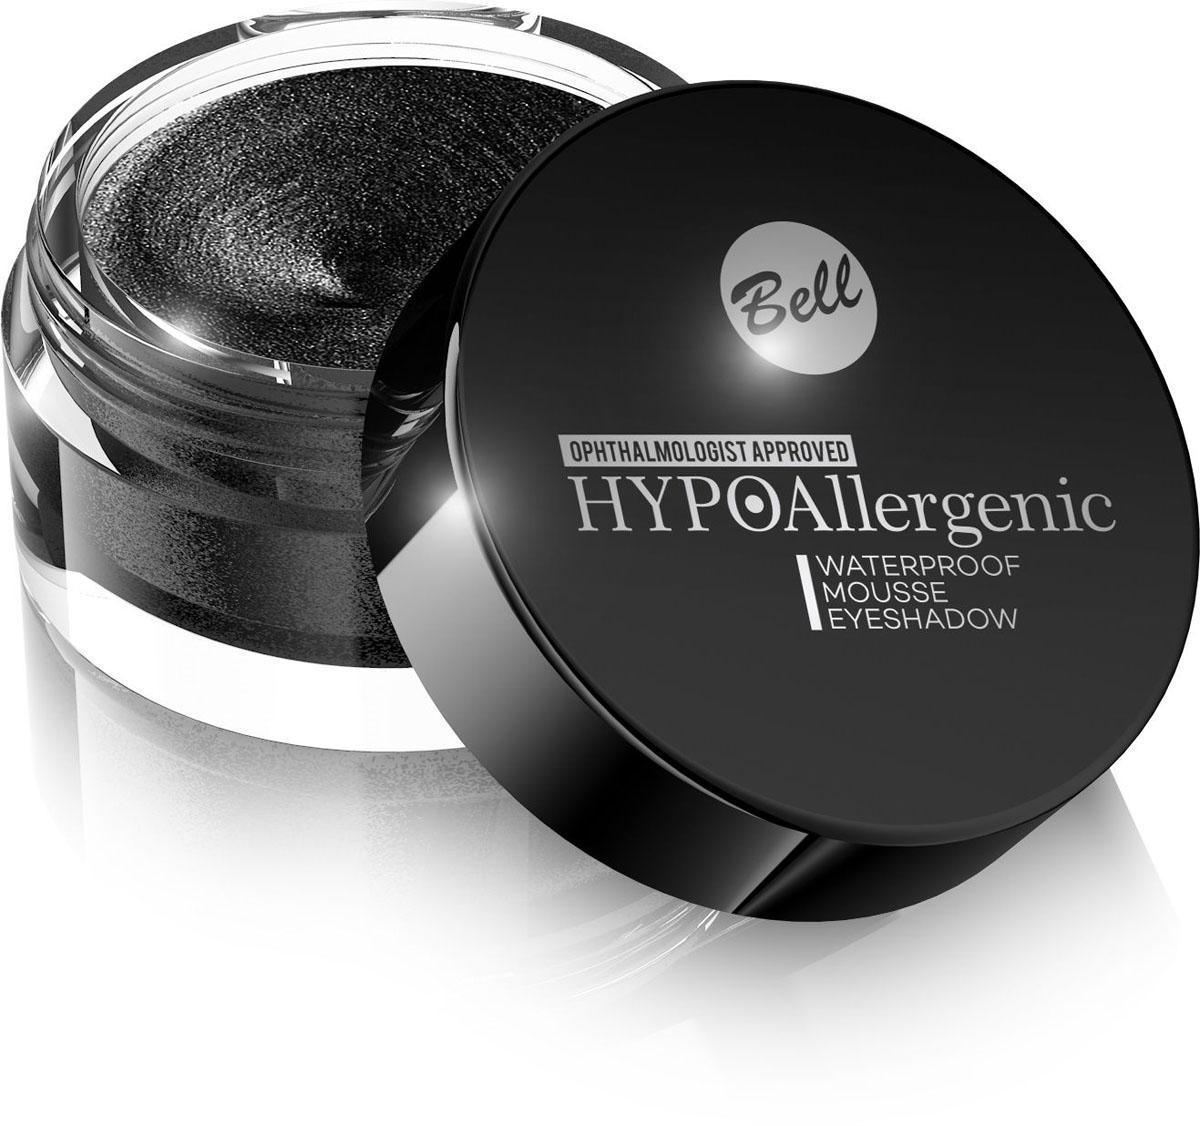 Bell Hypoallergenic Кремовые тени для век Waterproof Mousse Eyeshadow, Тон №05, 23 млBcmHA005